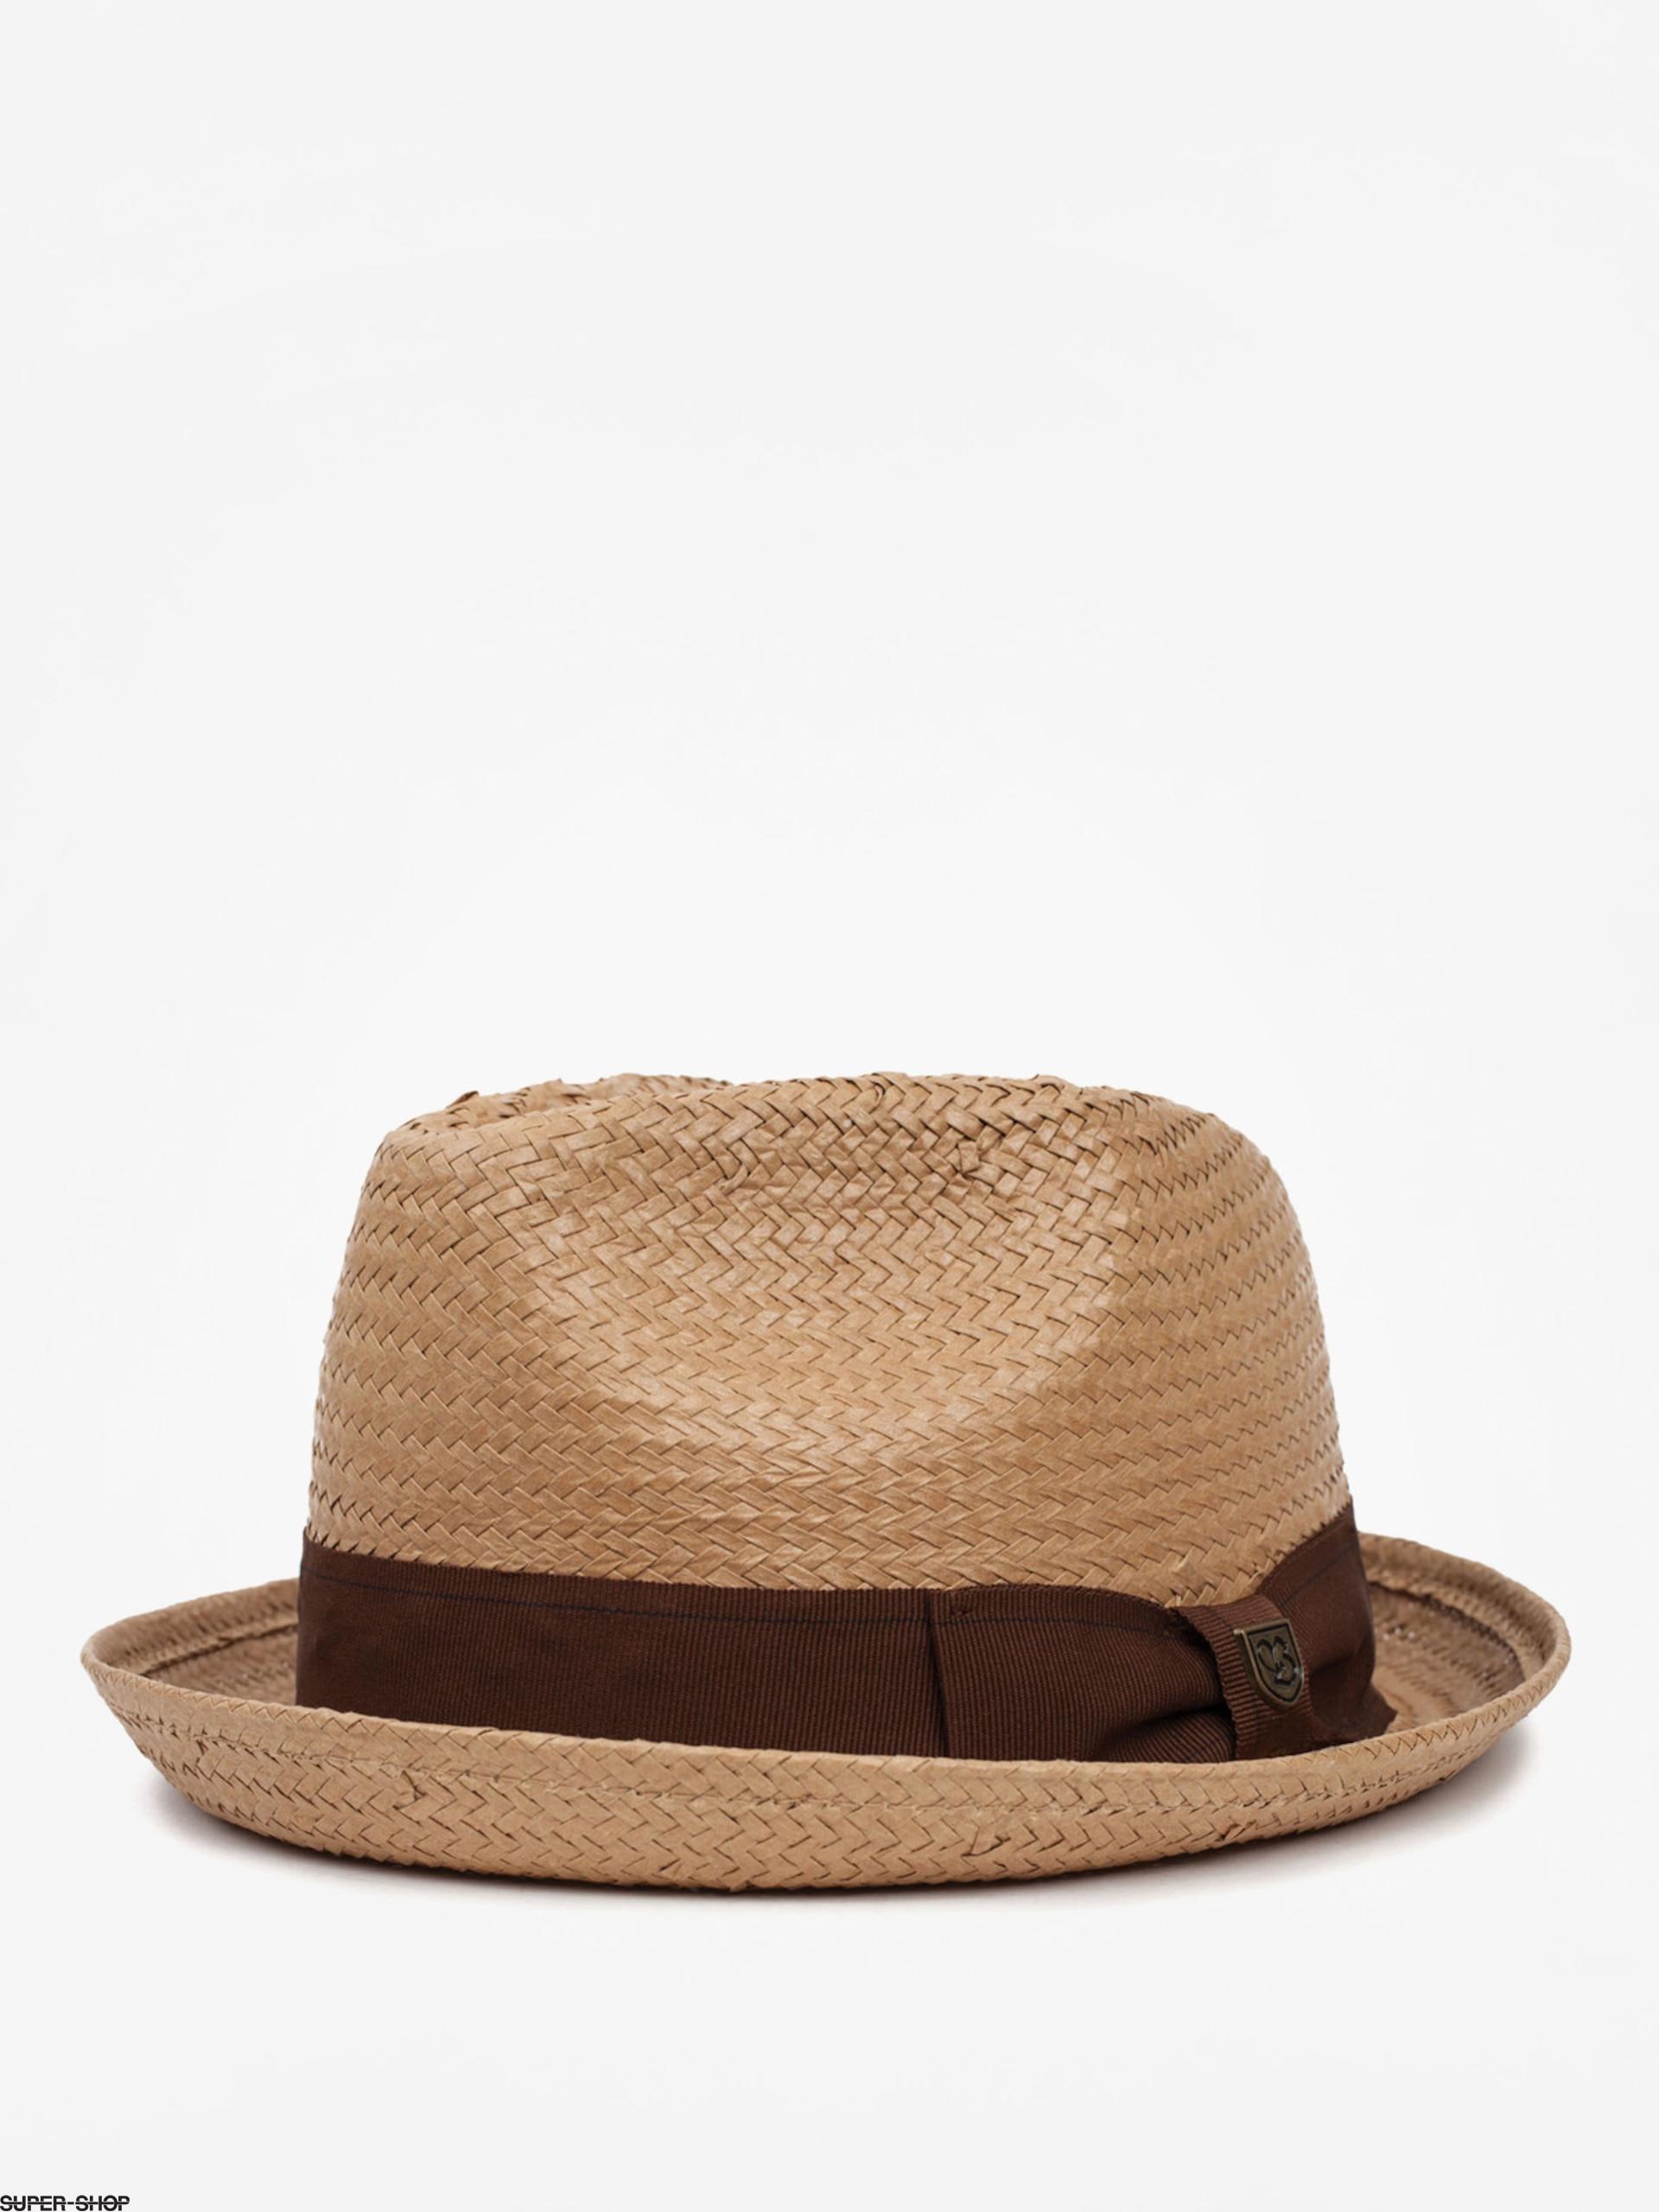 4d474348 937128-w1920-brixton-hat-castor-fedora-latte.jpg